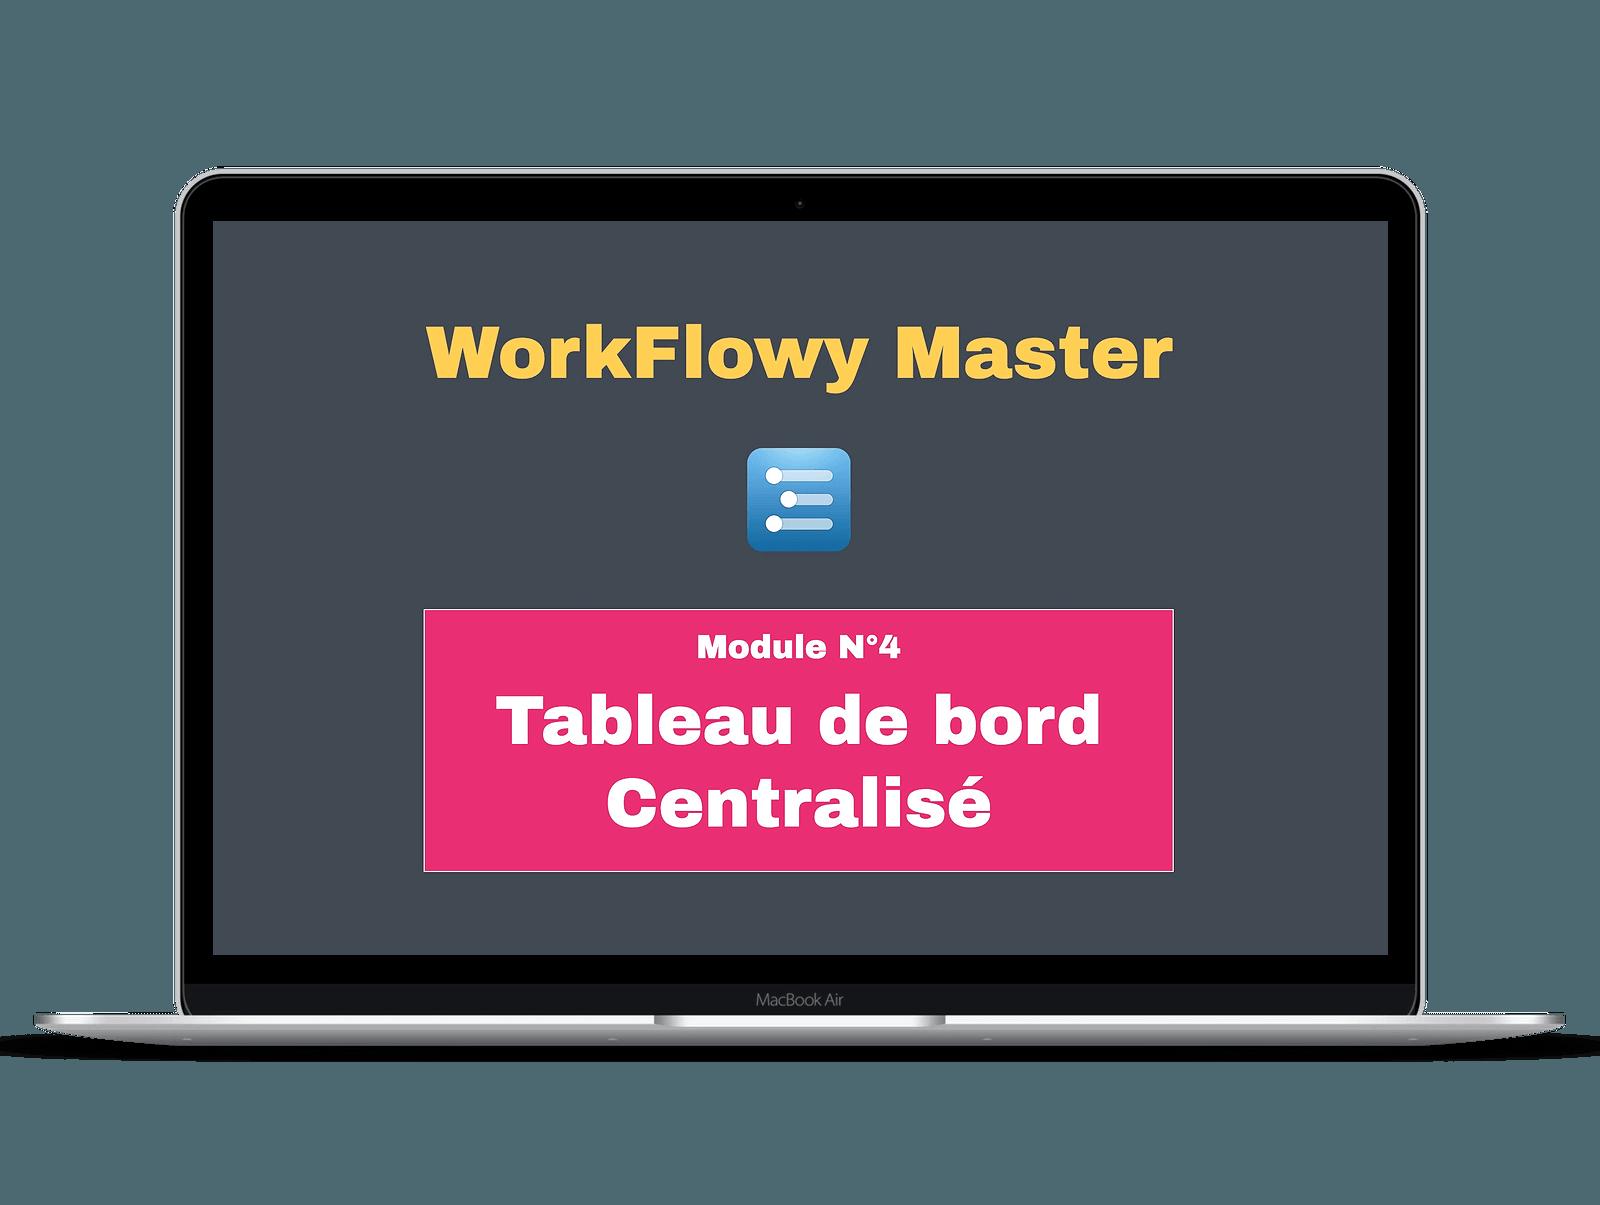 Guide workflowy